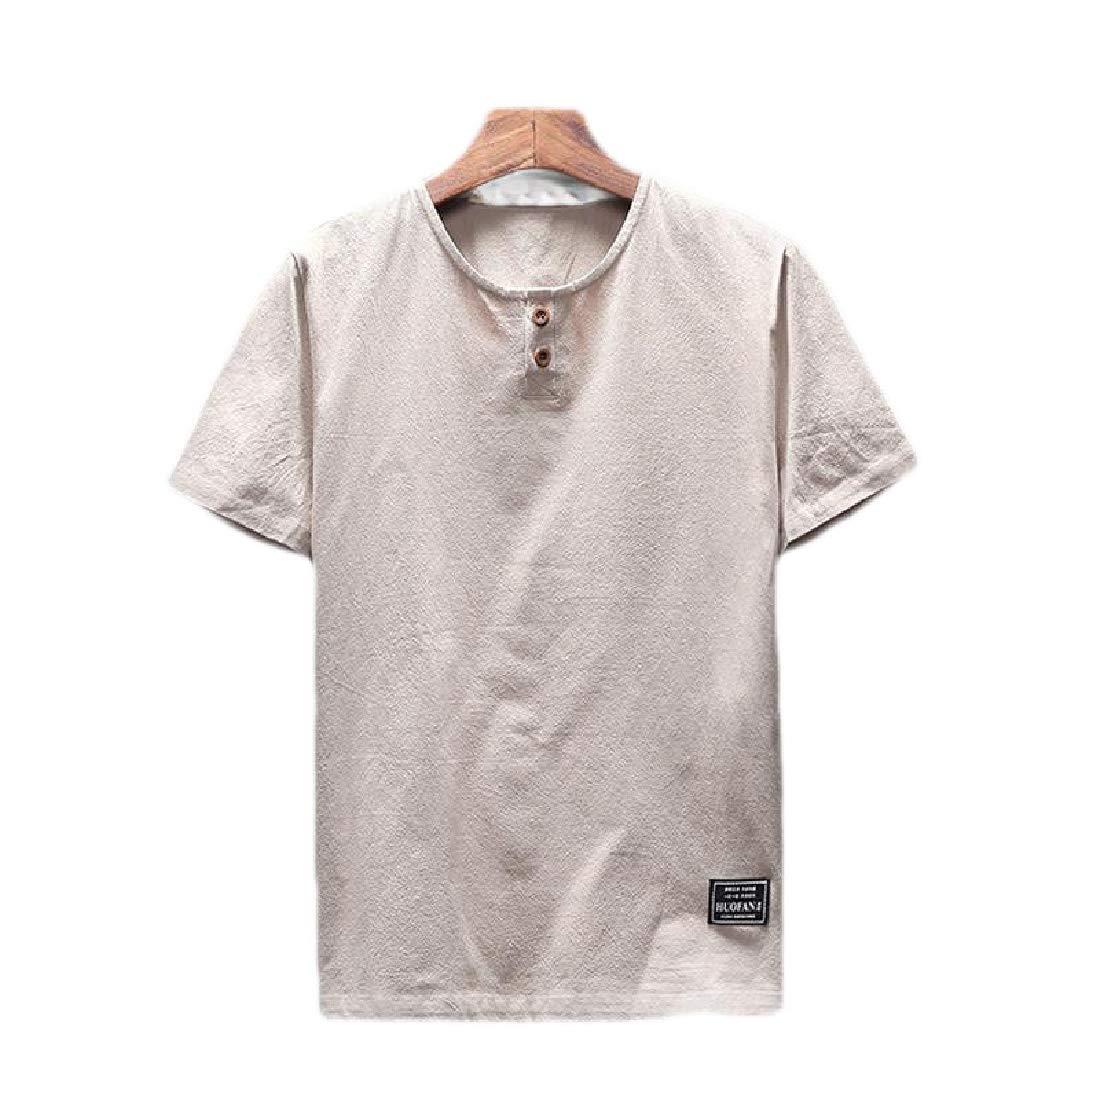 pipigo Men Summer Chinese Style Short Sleeve Stylish Linen T-Shirt Tee Top